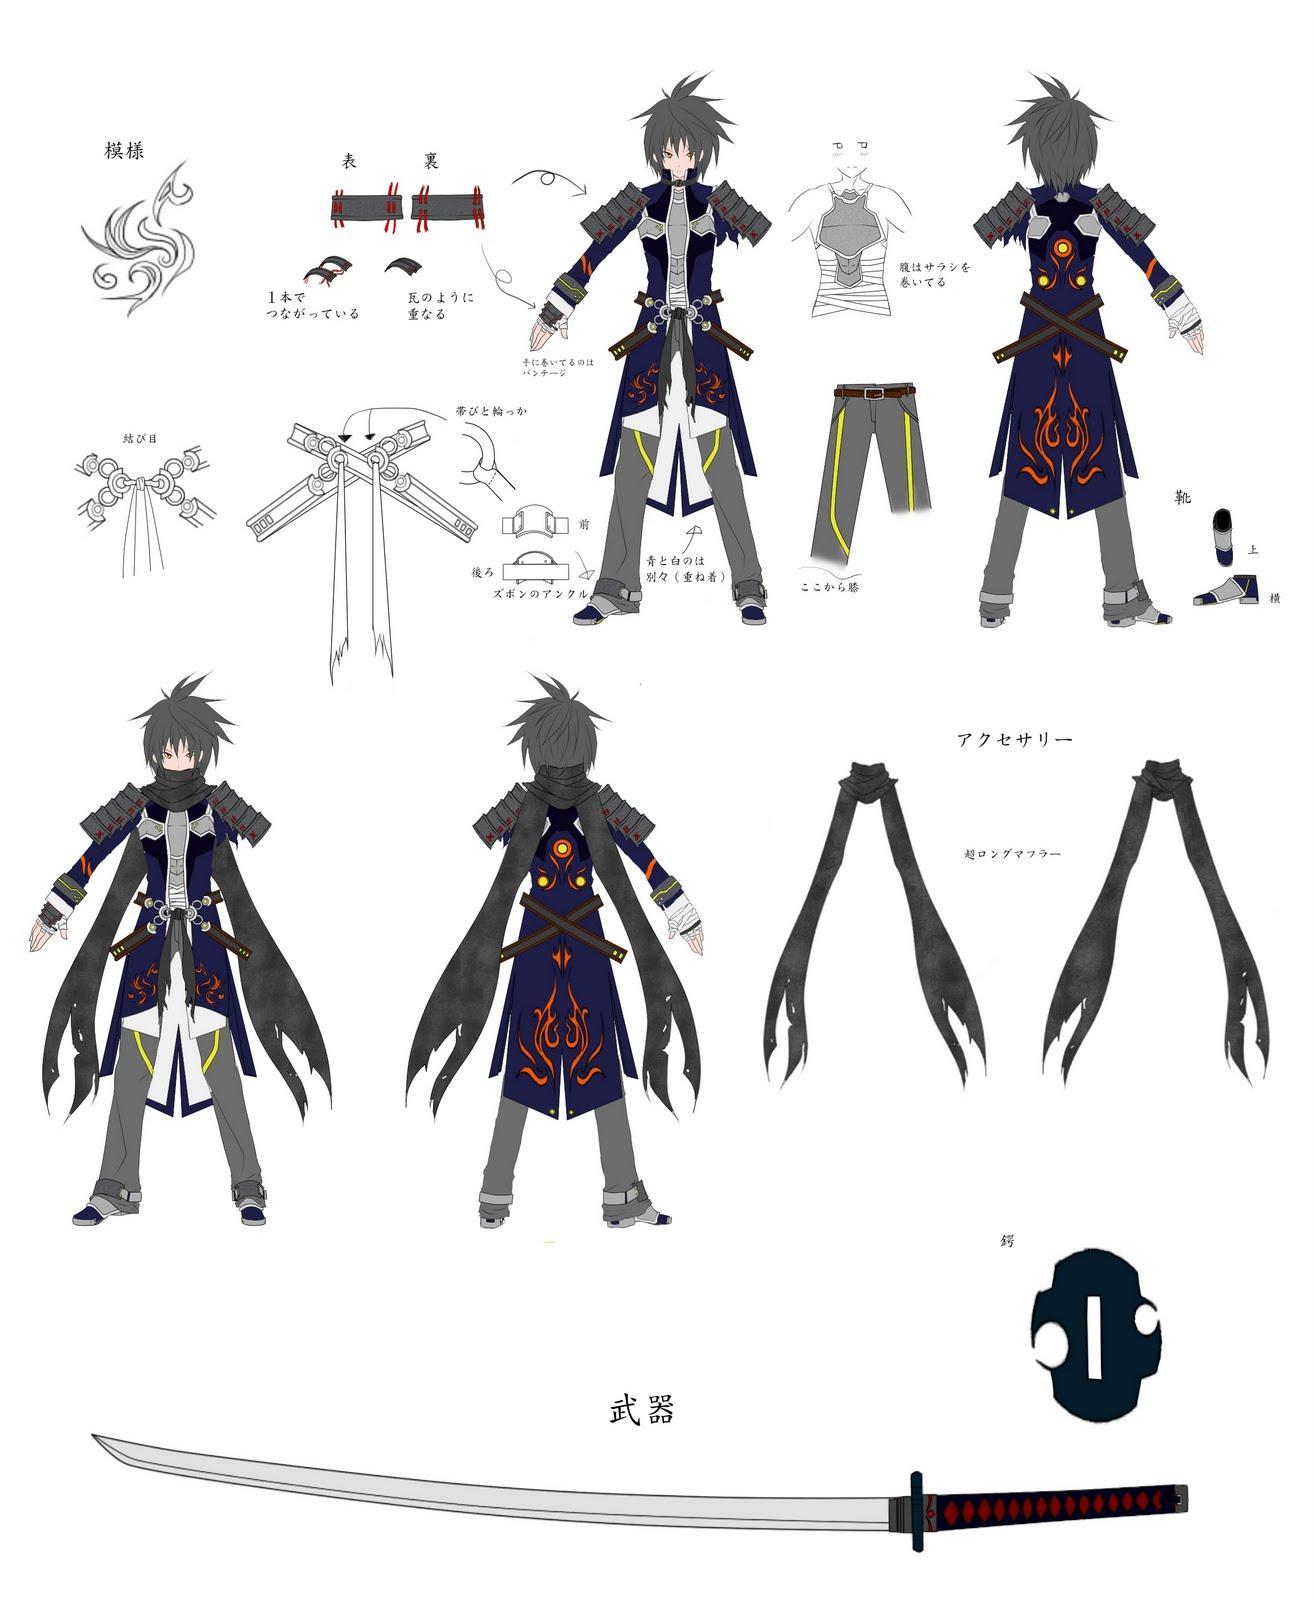 http://2.bp.blogspot.com/-Ezb_Atlyhgc/Tqexod4fcLI/AAAAAAAAIfs/GF8w1KorYAI/s1600/Elsword_jp_DesignContest_2nd_Raven.jpg